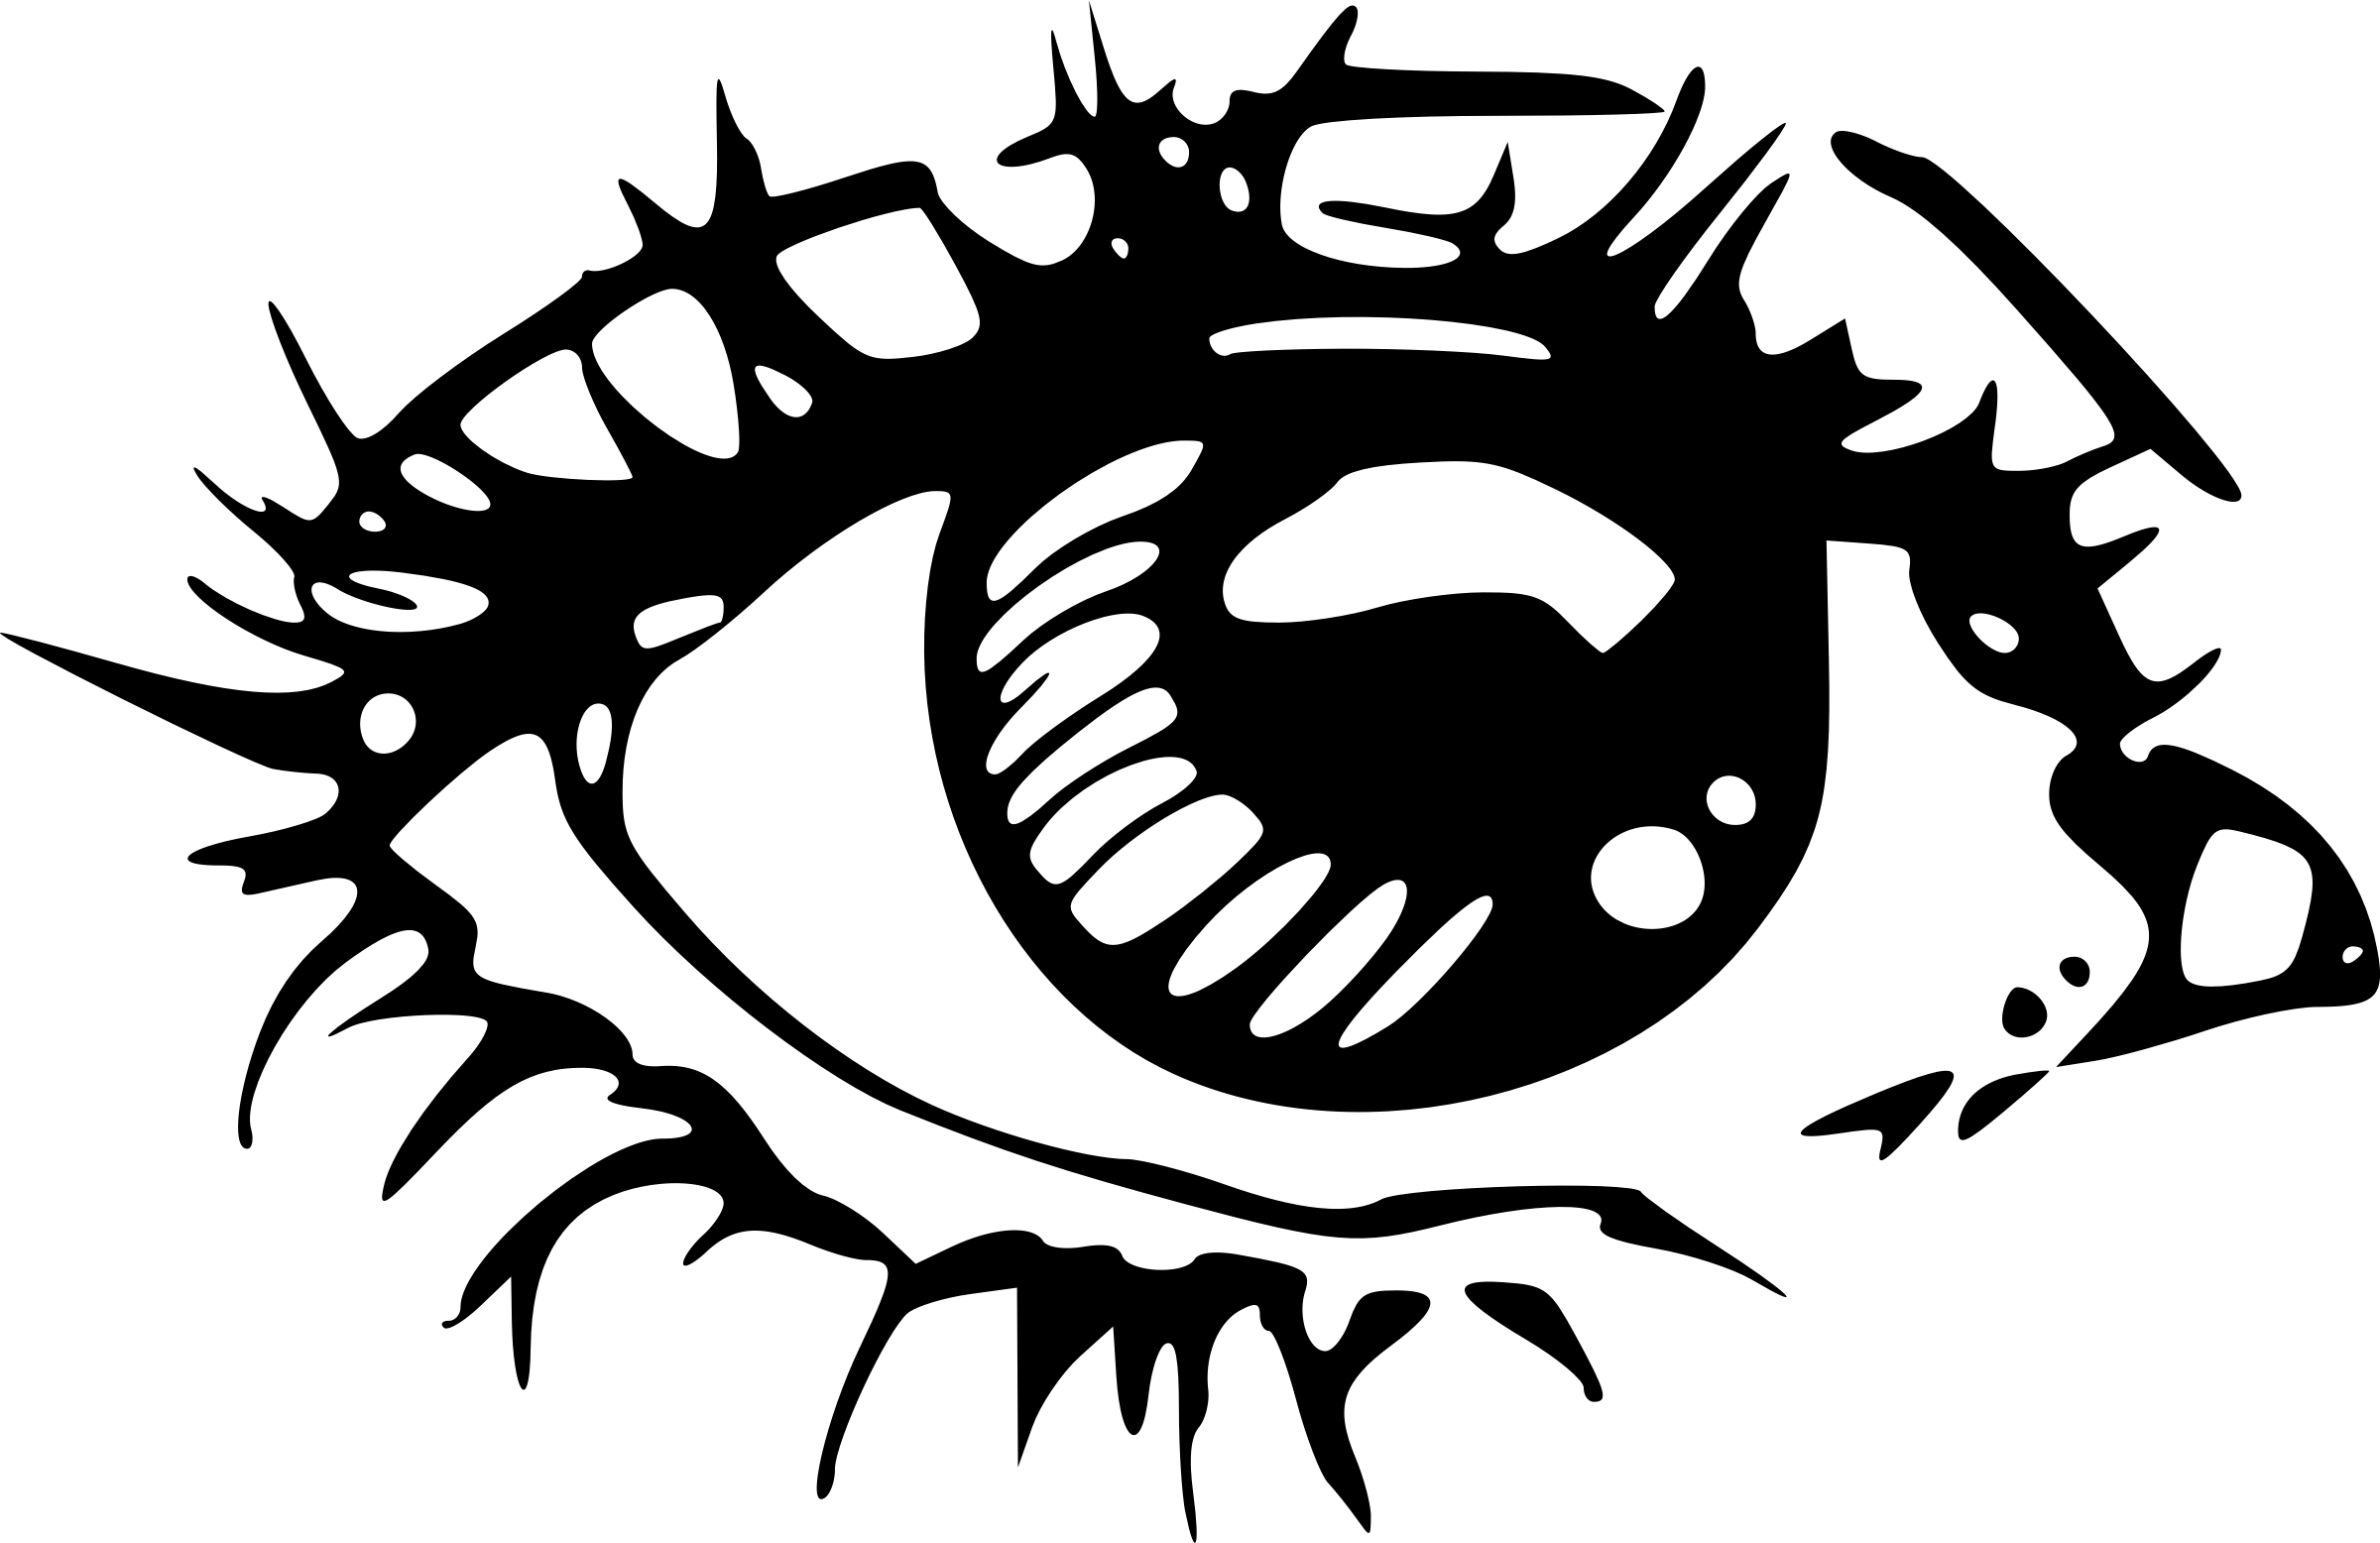 2400x1556 Clipart